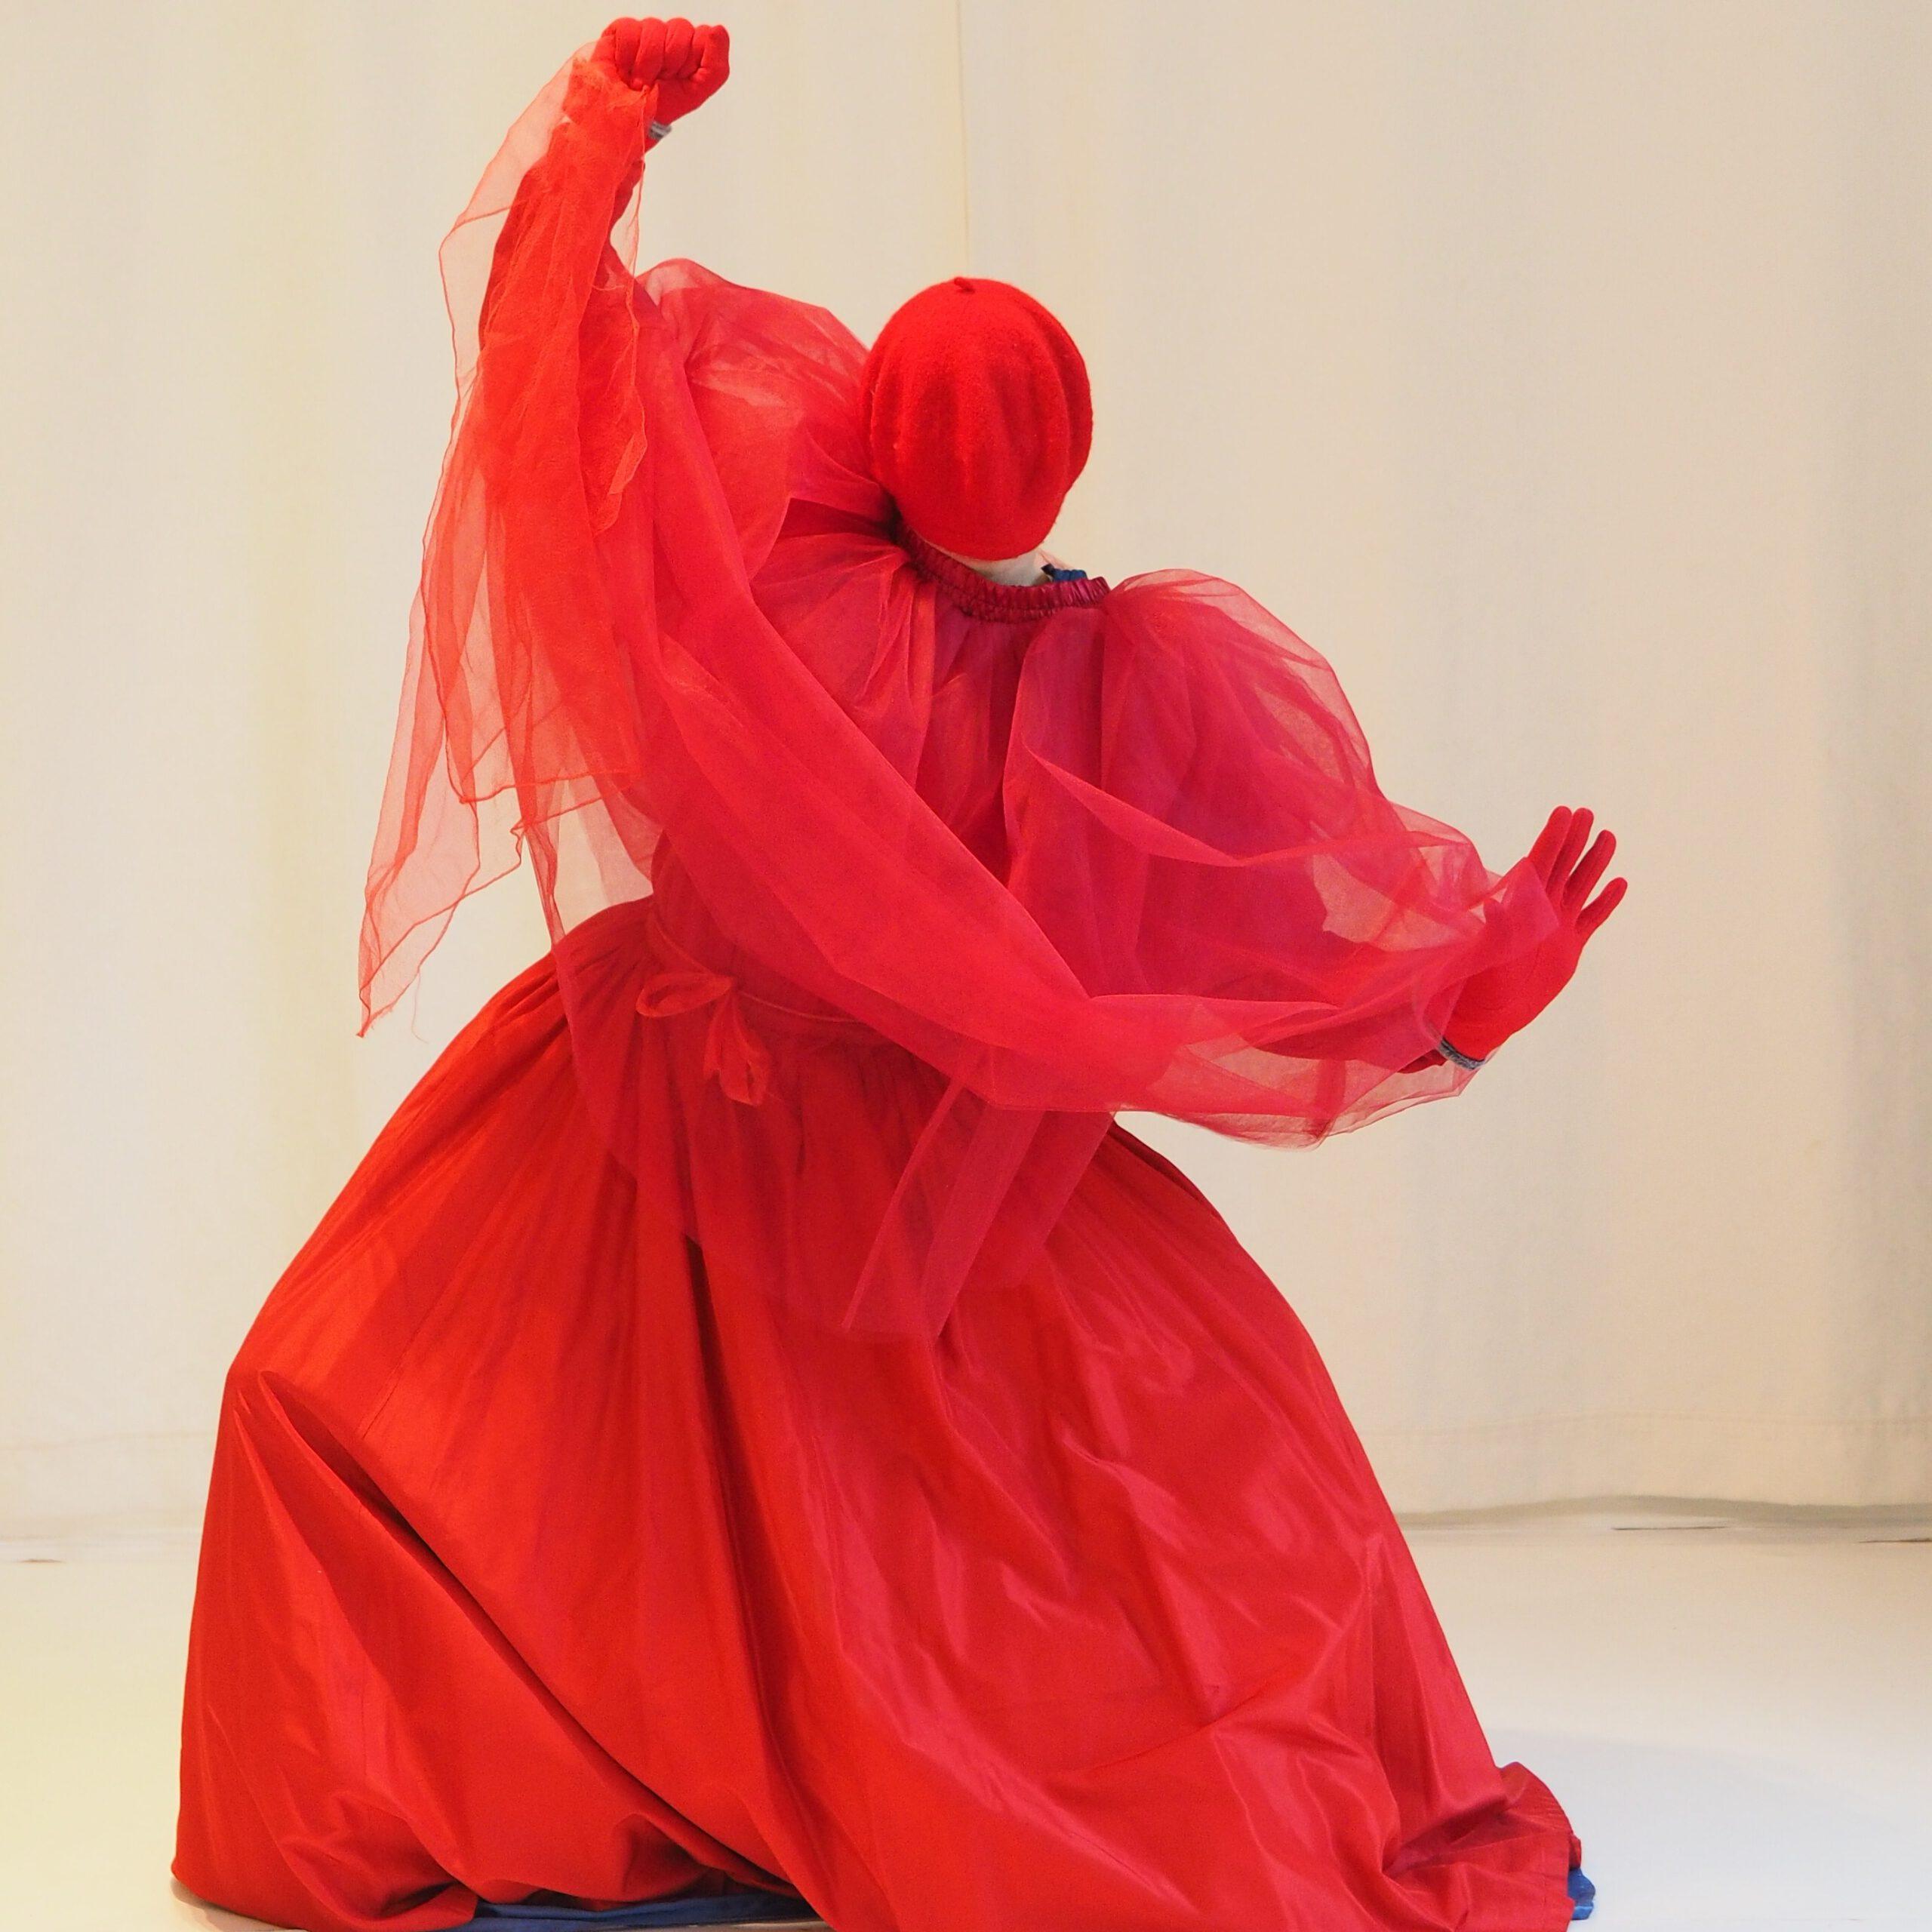 #virginqueen // Theater-Tanz-Performance